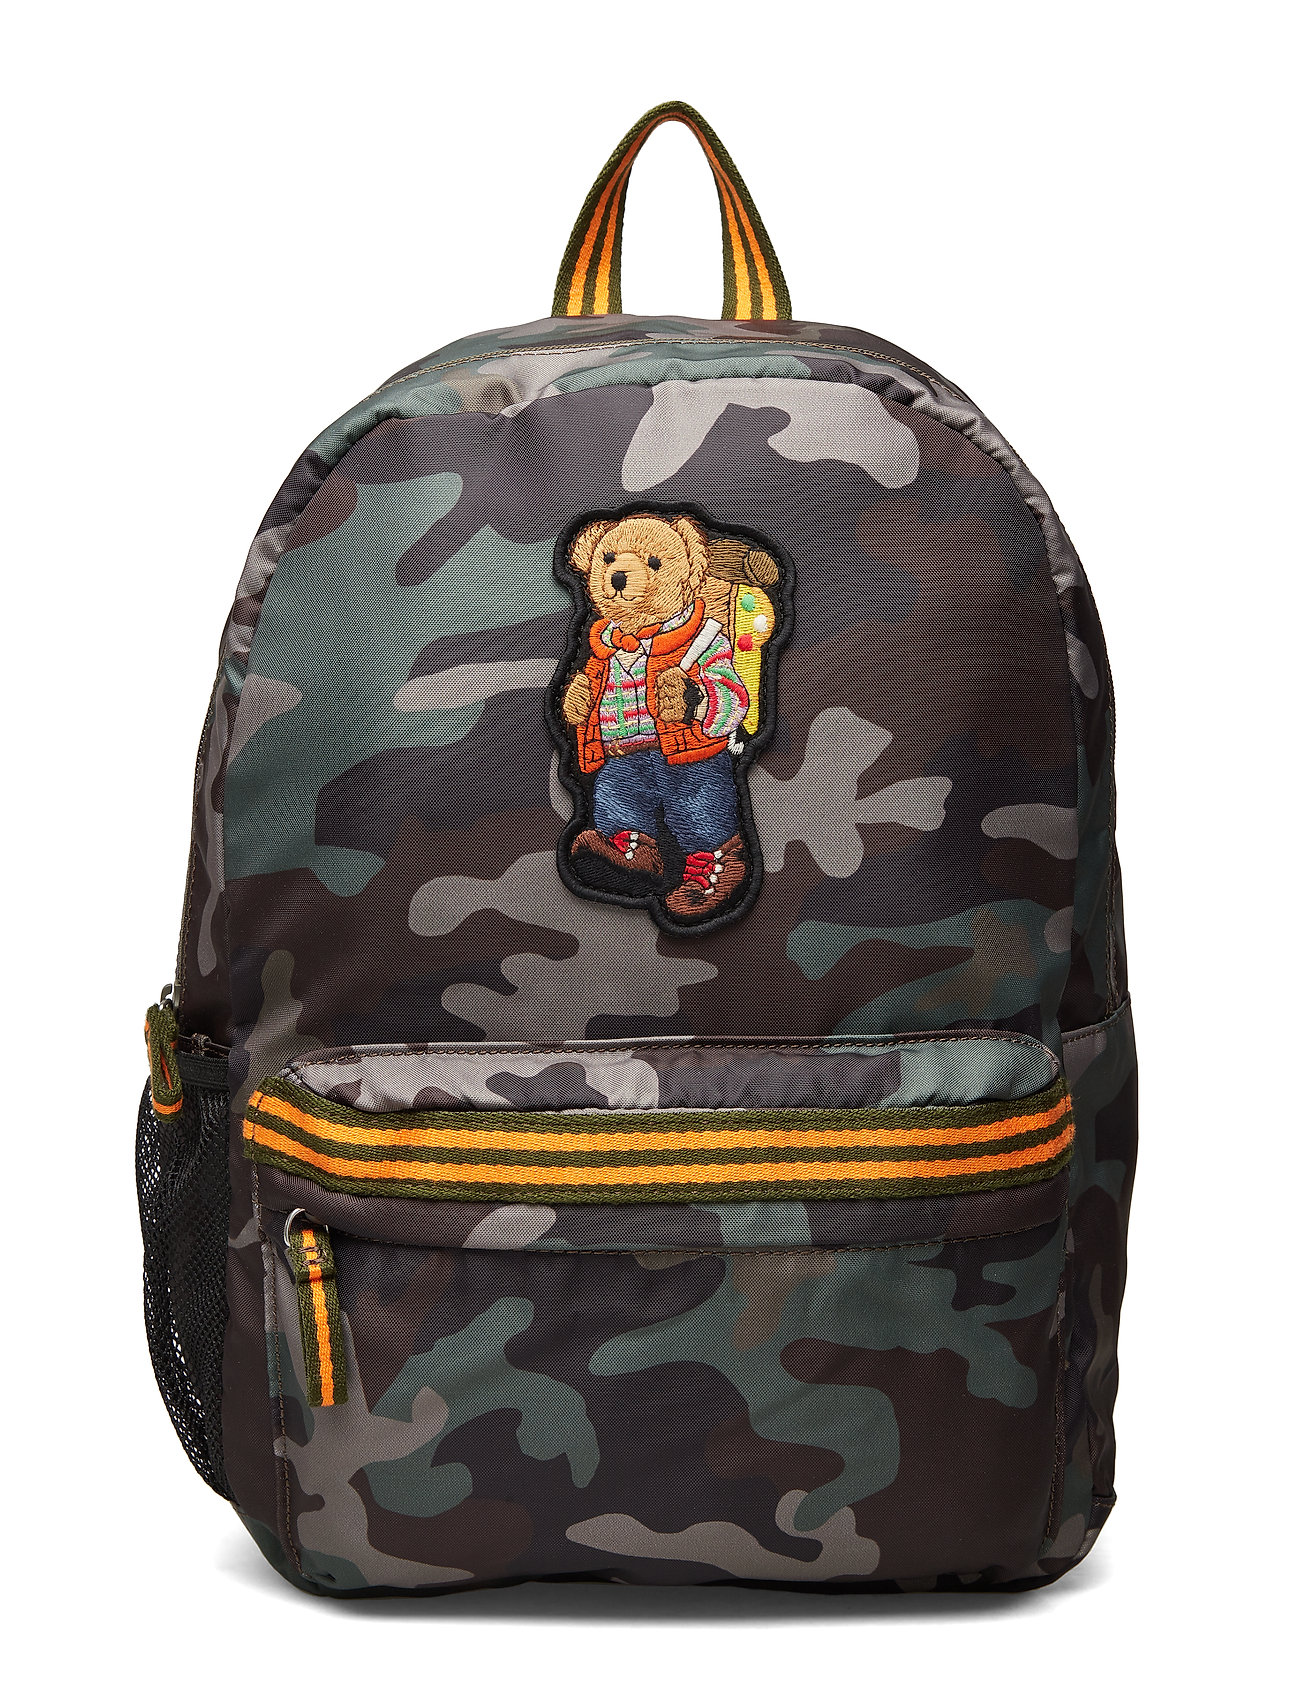 Ralph Lauren Kids Large Polo Bear Camo Backpack - CAMO